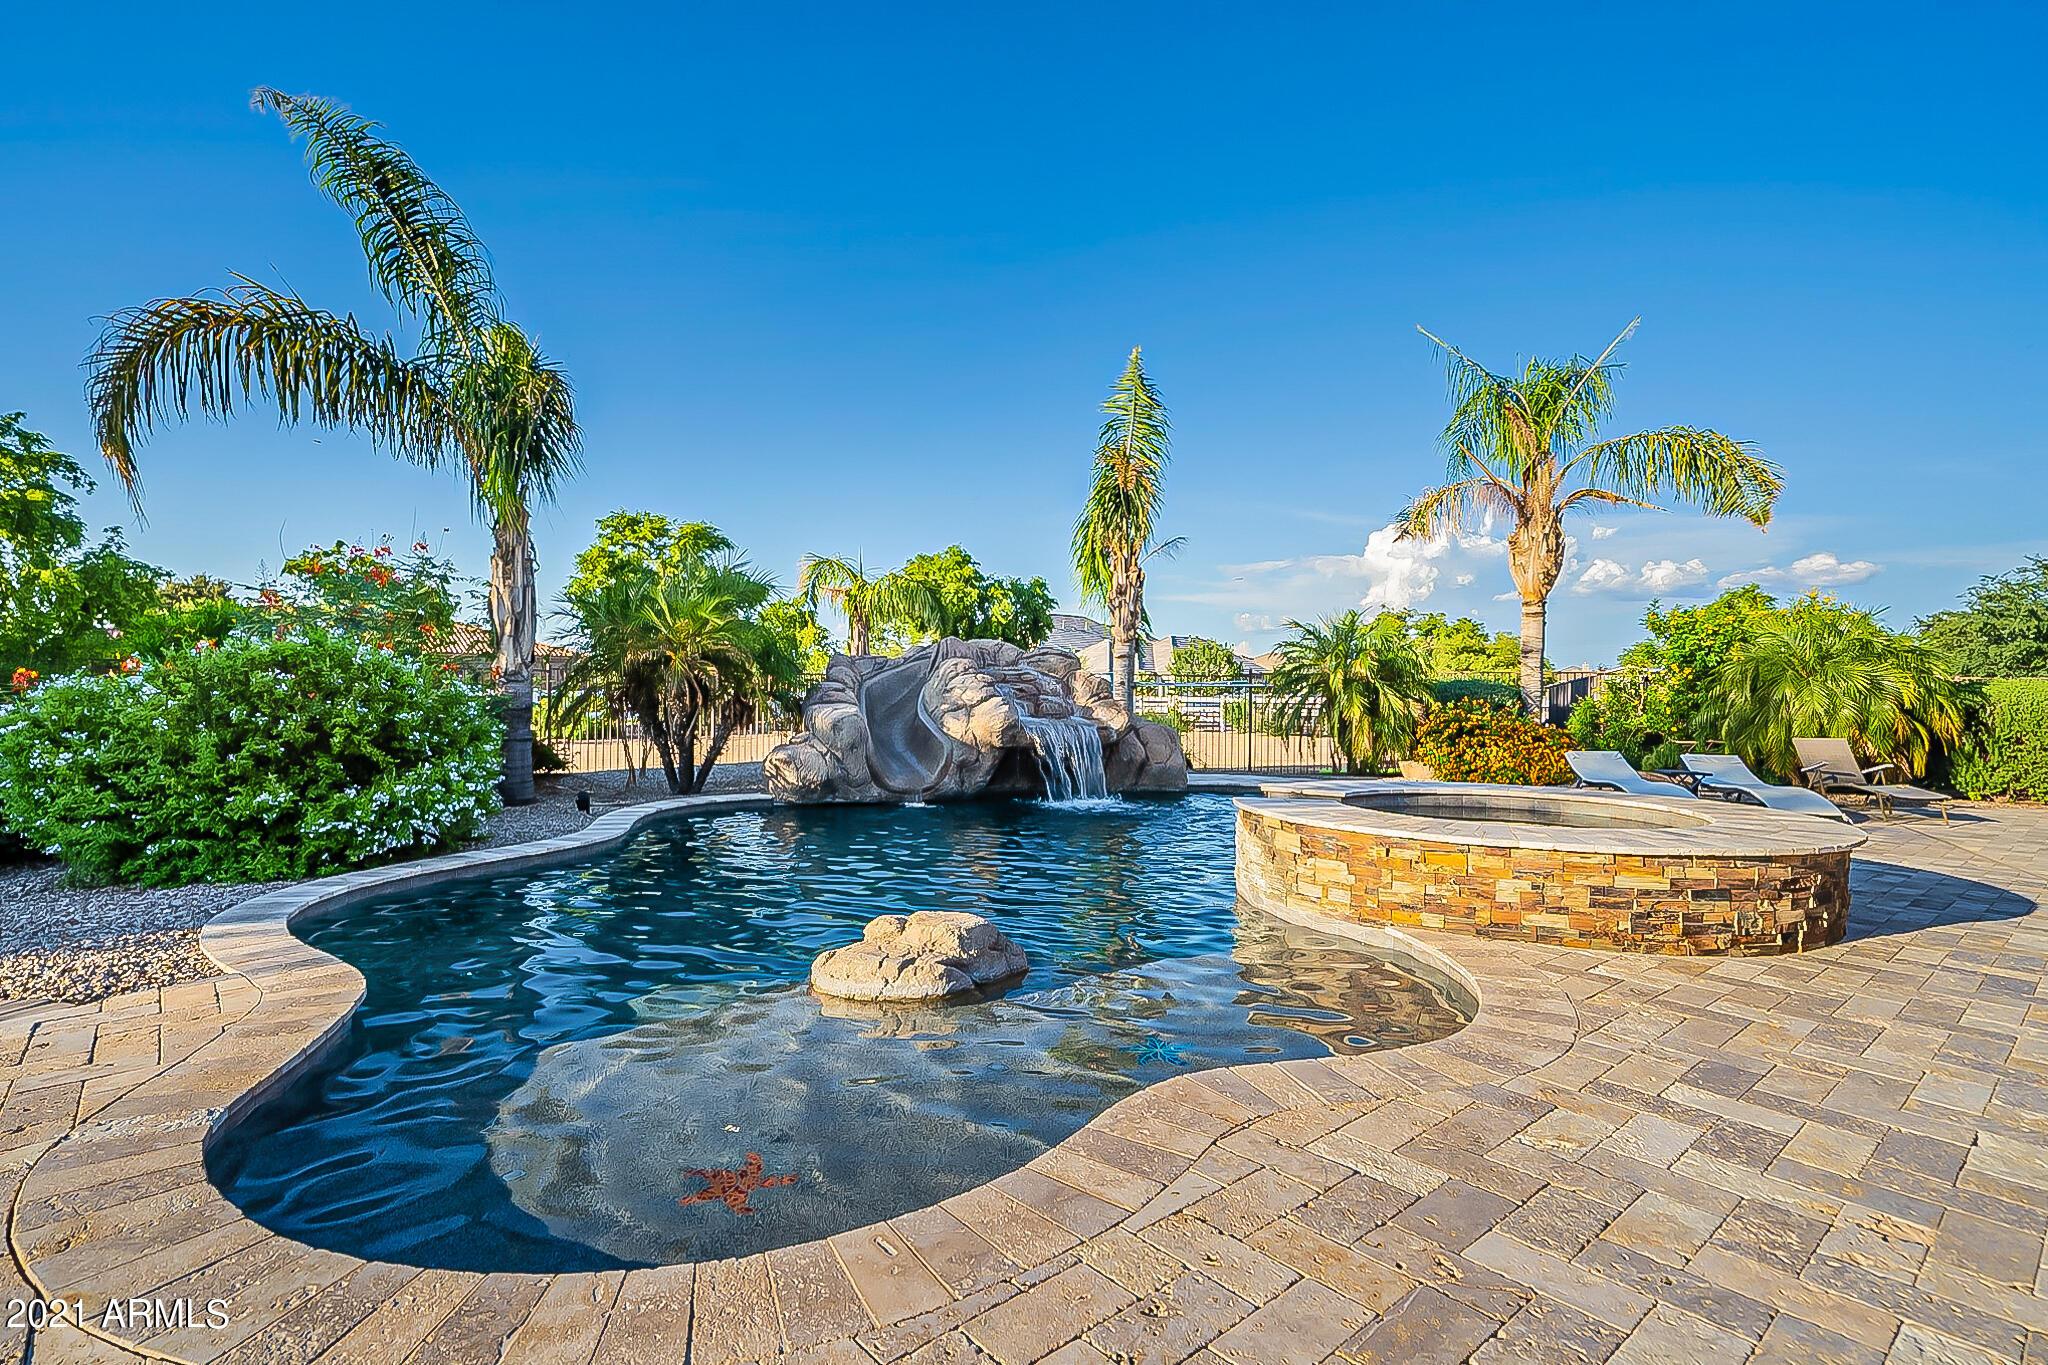 21484 MEWES Road, Queen Creek, Arizona 85142, 6 Bedrooms Bedrooms, ,4 BathroomsBathrooms,Residential,For Sale,MEWES,6265567